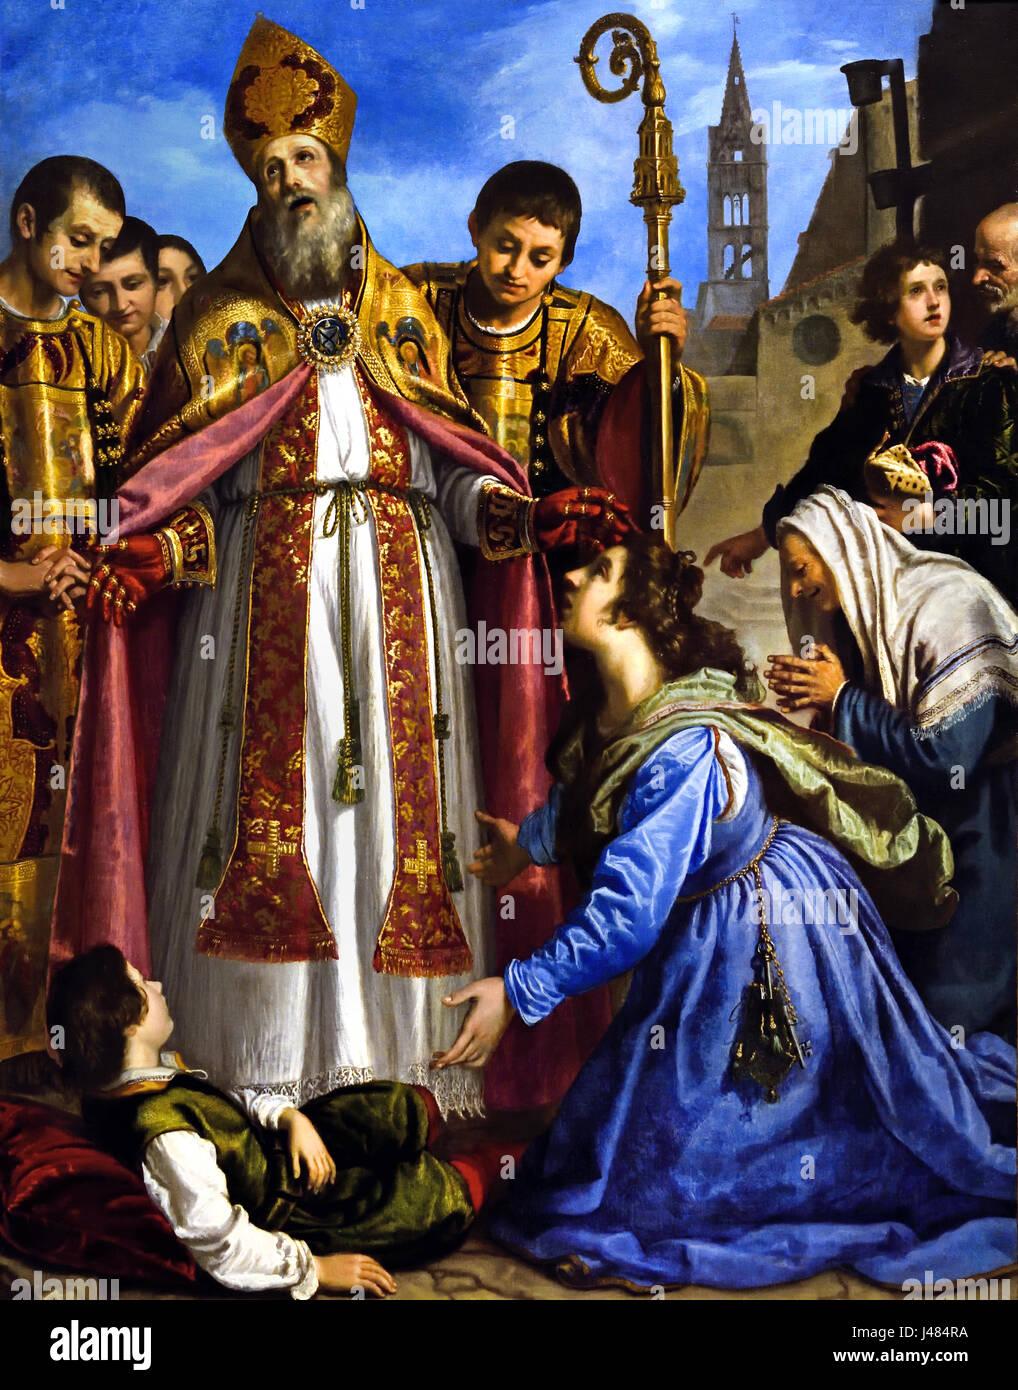 Saint Zenobius revives a Dead Boy  1610-20, Giovanni Bilivert 1585 - 1644 Italy Italian ( Saint Zenobius was a fifth - Stock Image